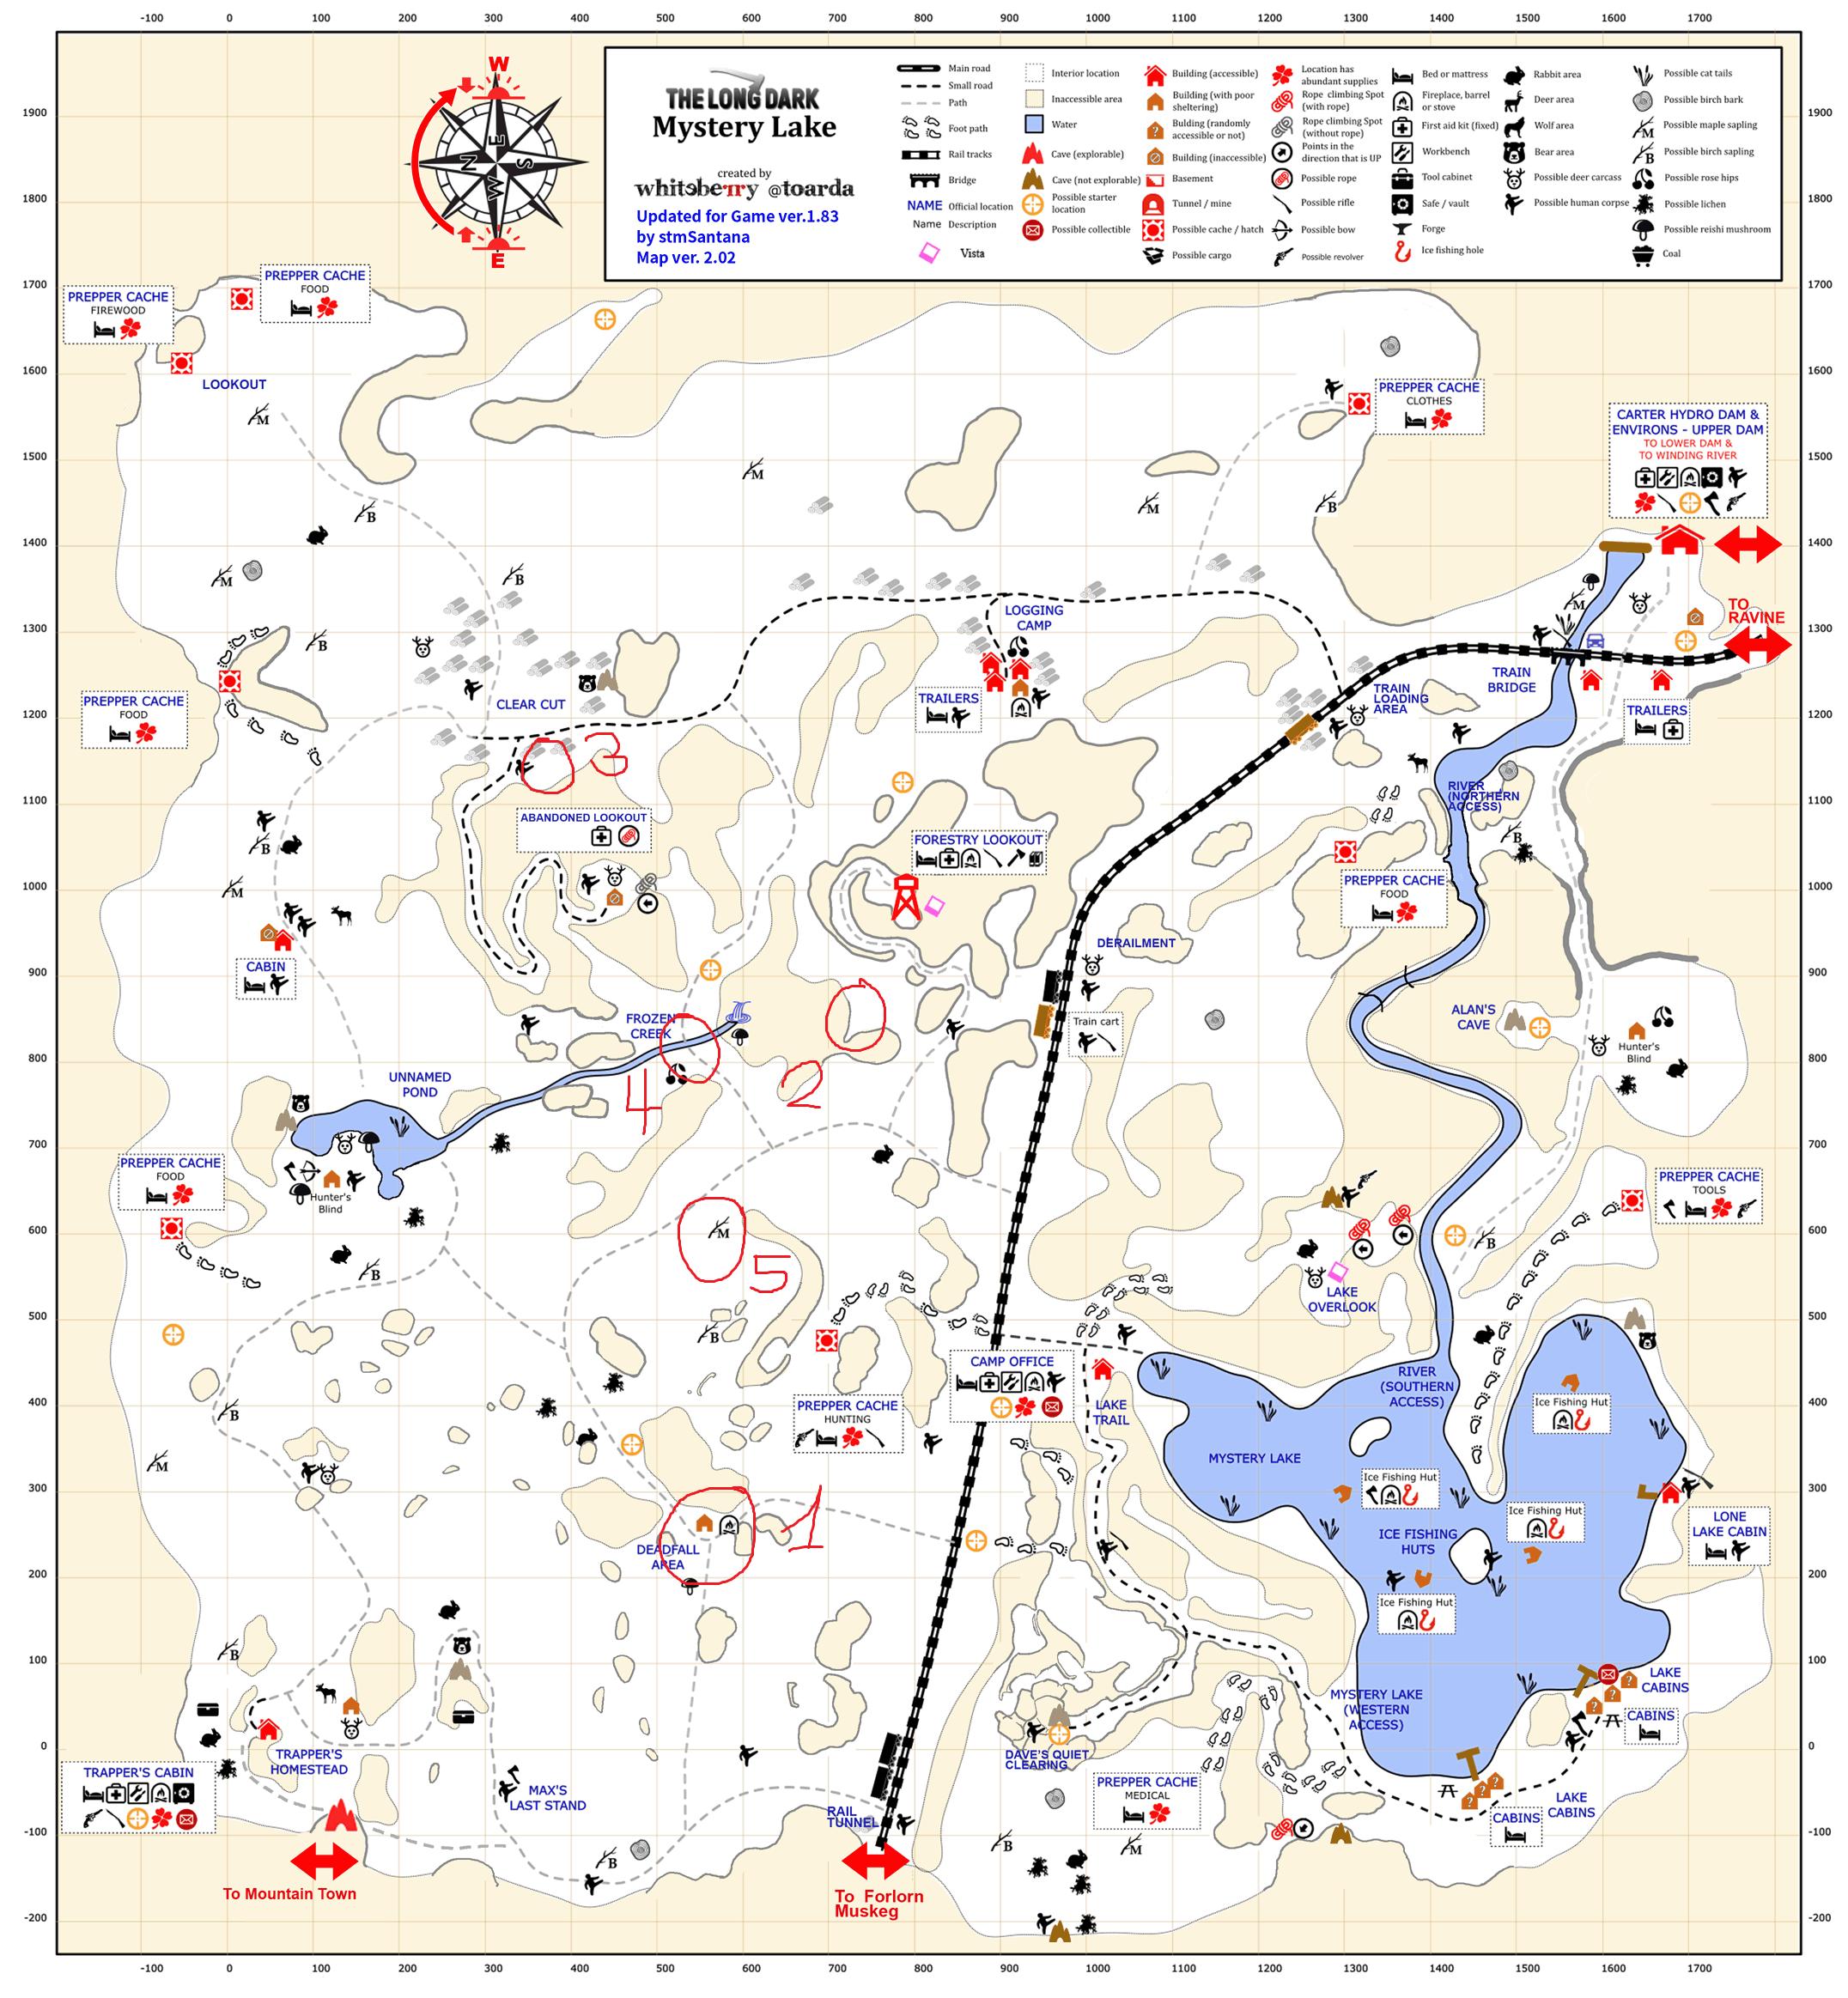 The Long Dark - Advanced rock cache placing + Top 5 caches per region - 10-Mistery Lake - 9B853B2